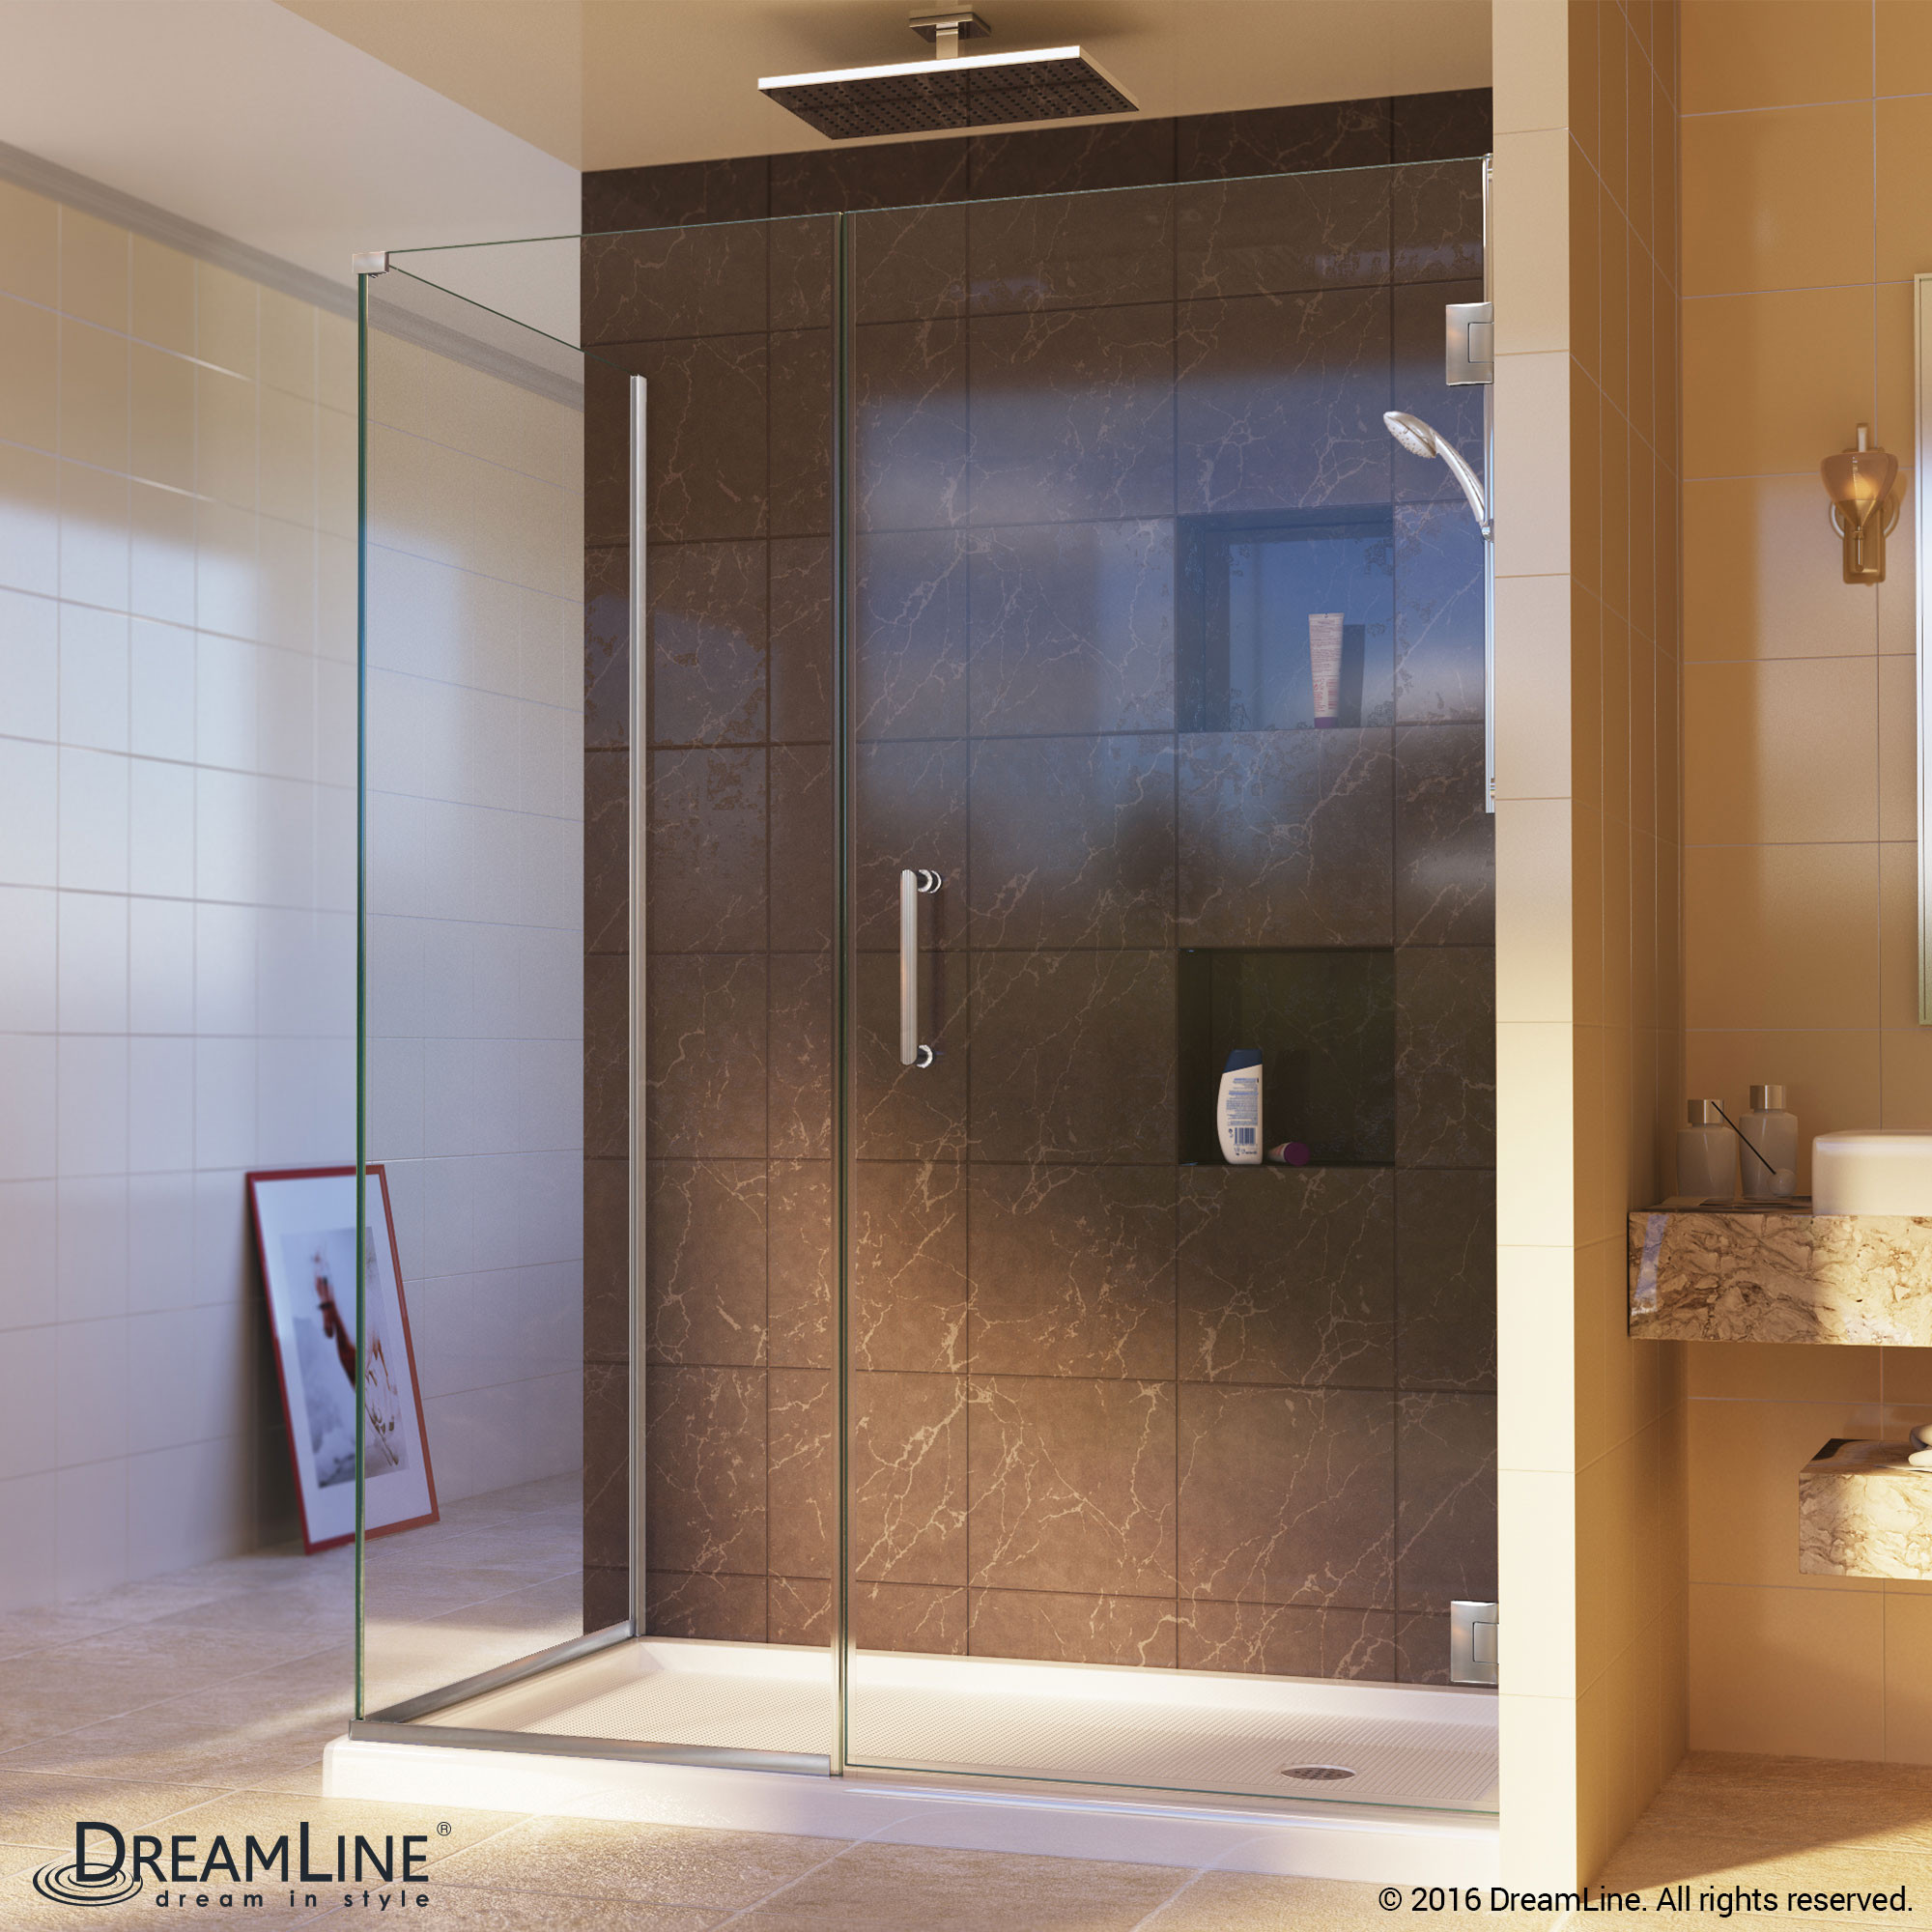 DreamLine SHEN-24390340-04 Unidoor Plus Hinged Shower Enclosure In Brushed Nickel Finish Hardware